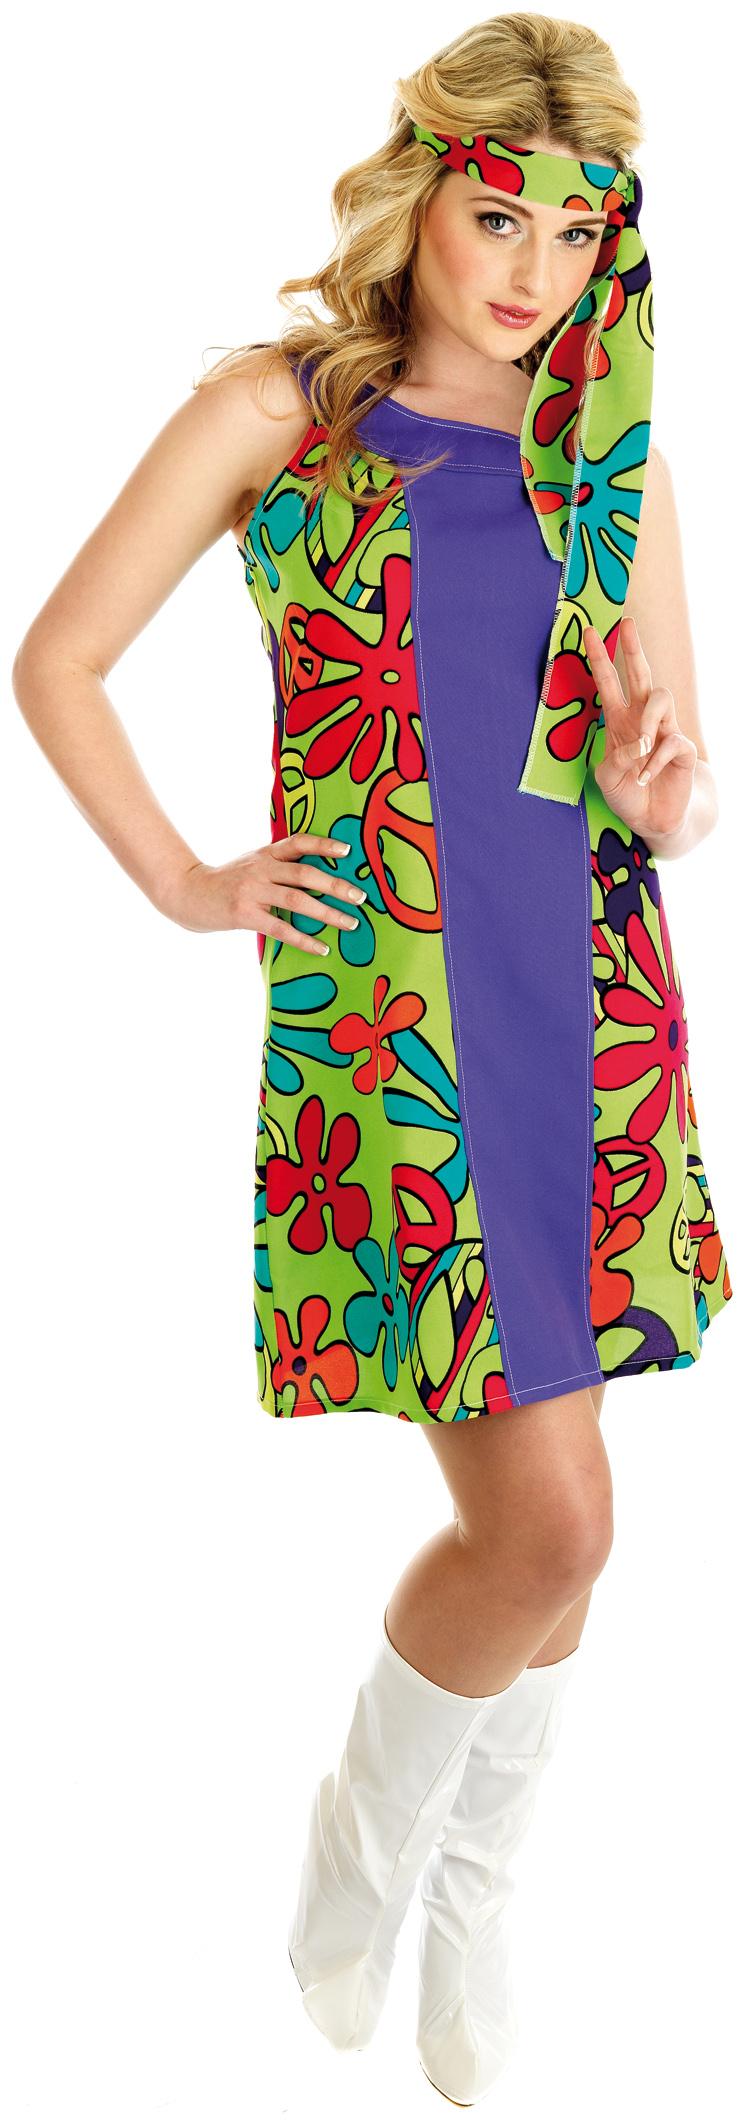 UV Purple Hippie Dress Ladies Hippy Fancy Dress 60s 70s Costume Outfit UK 6-22 | eBay